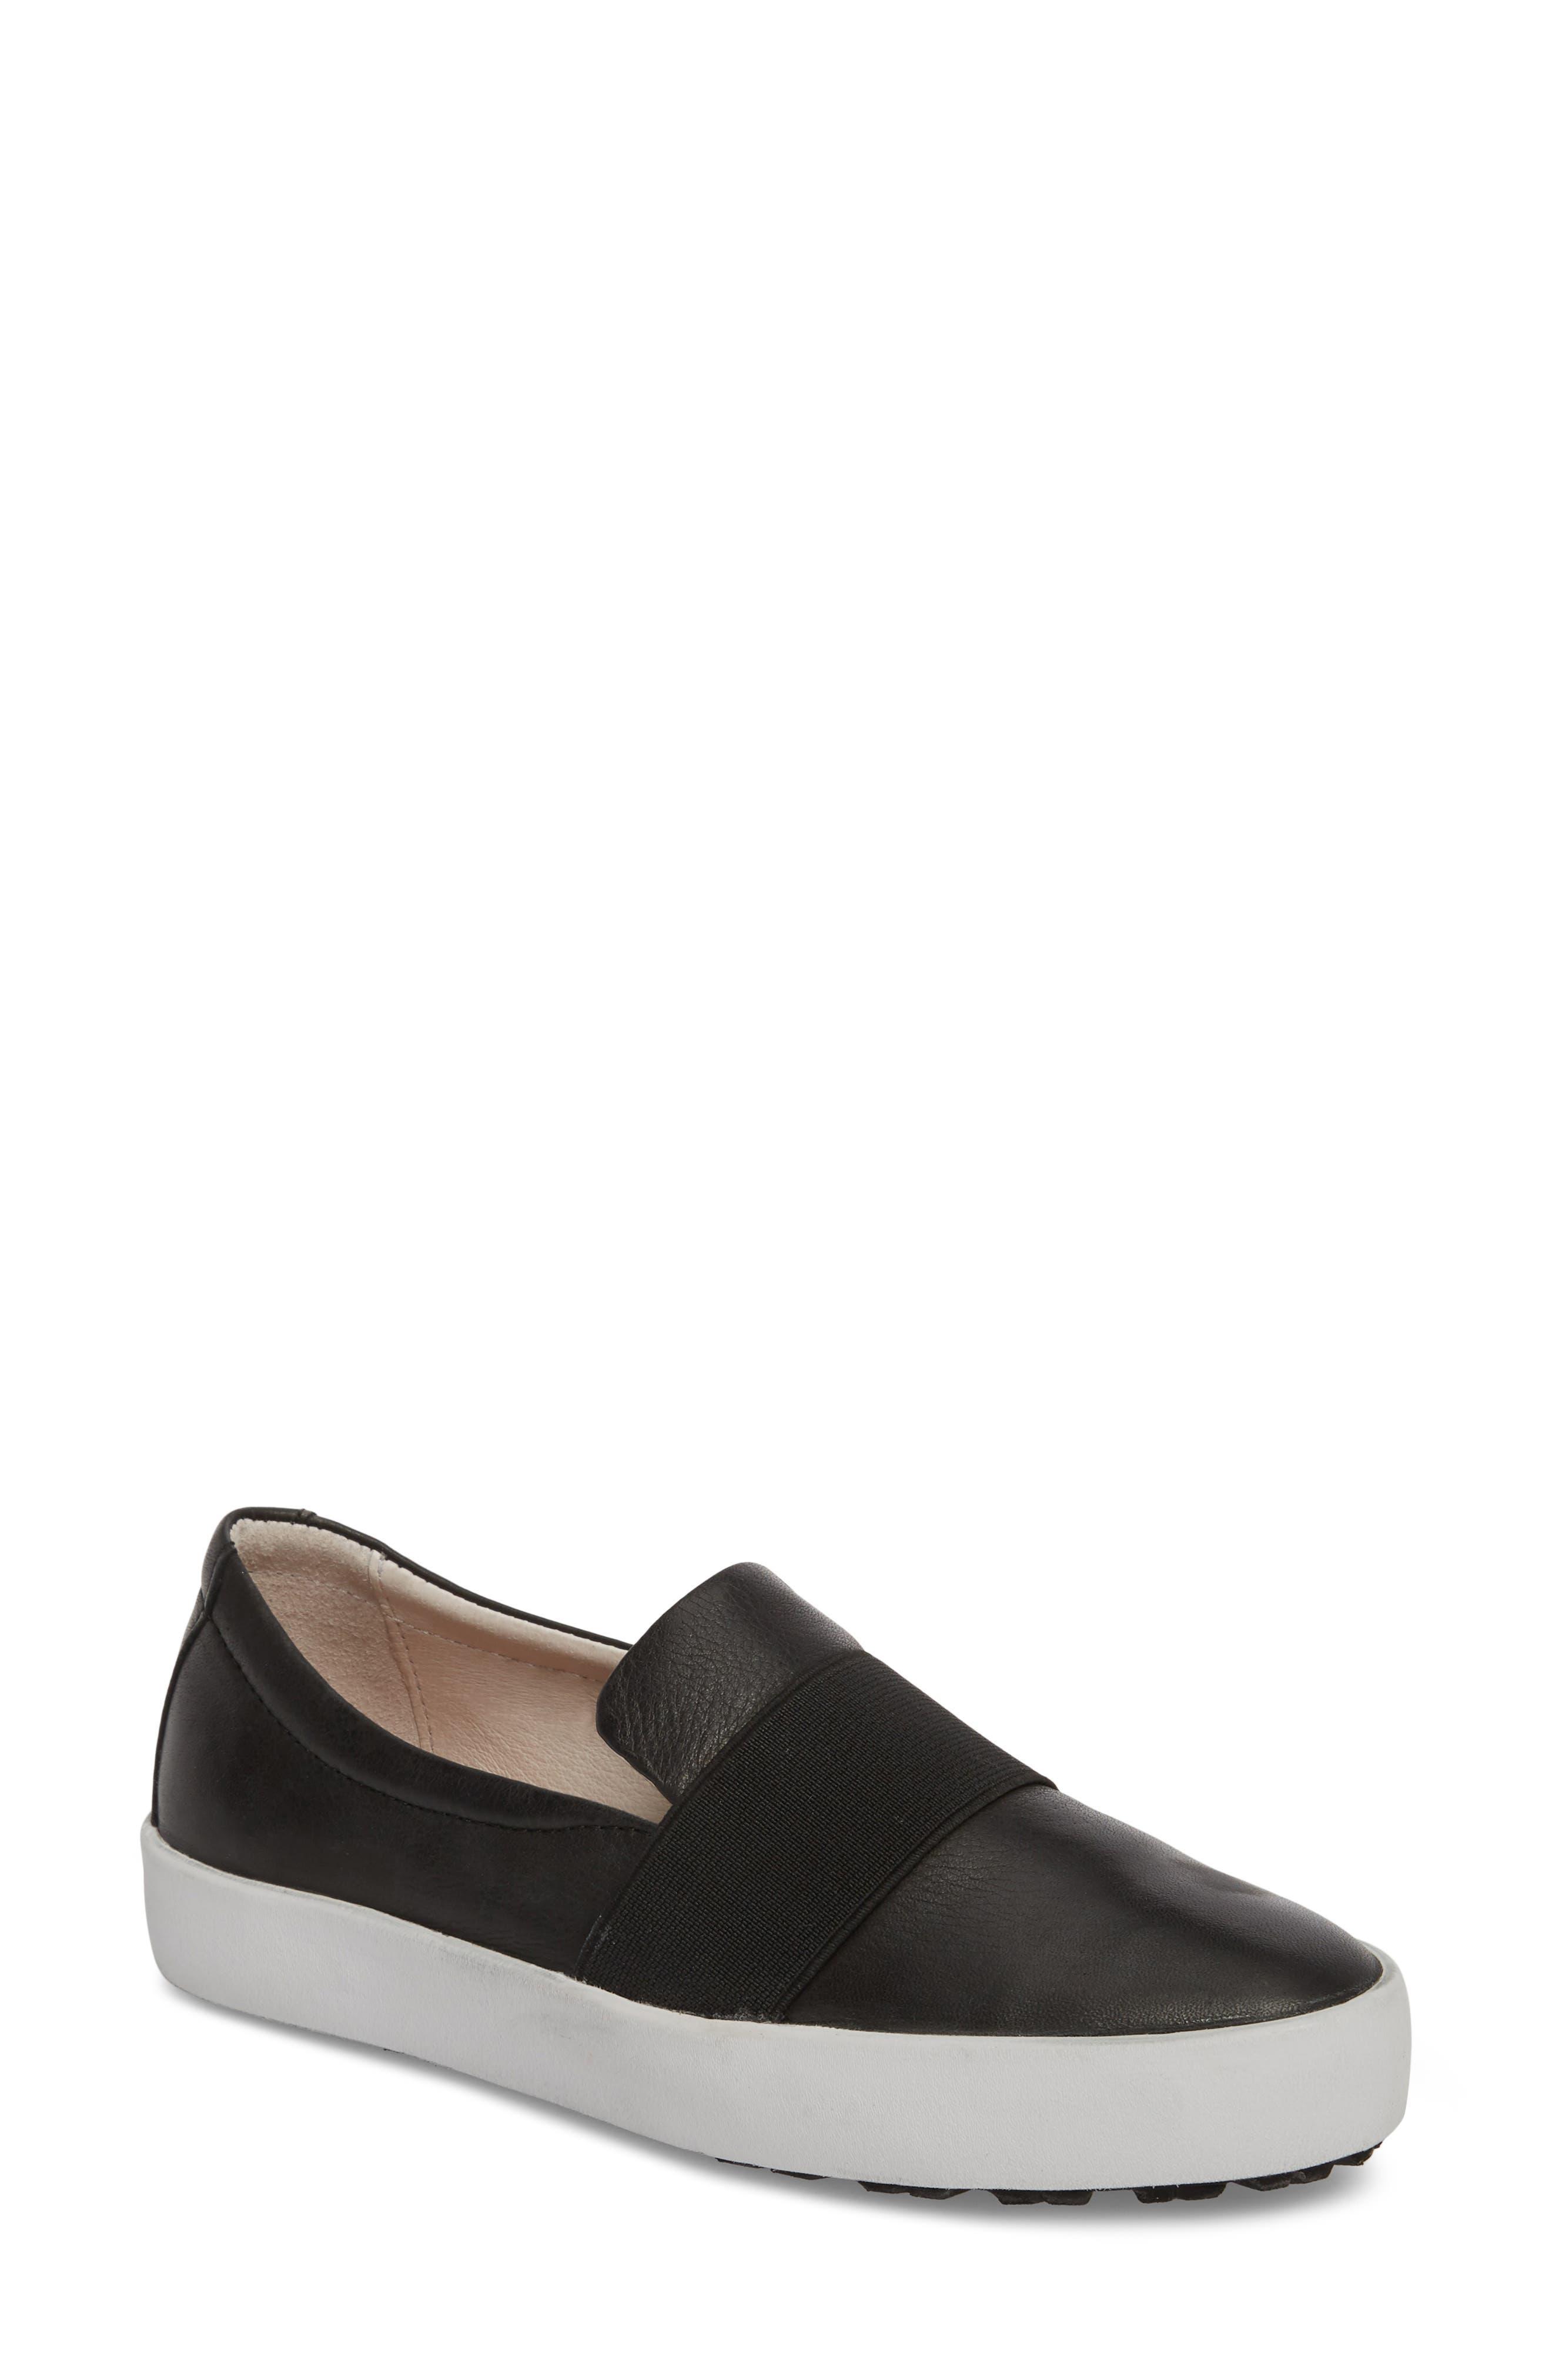 Blackstone Pl99 Slip-On Sneaker, Black